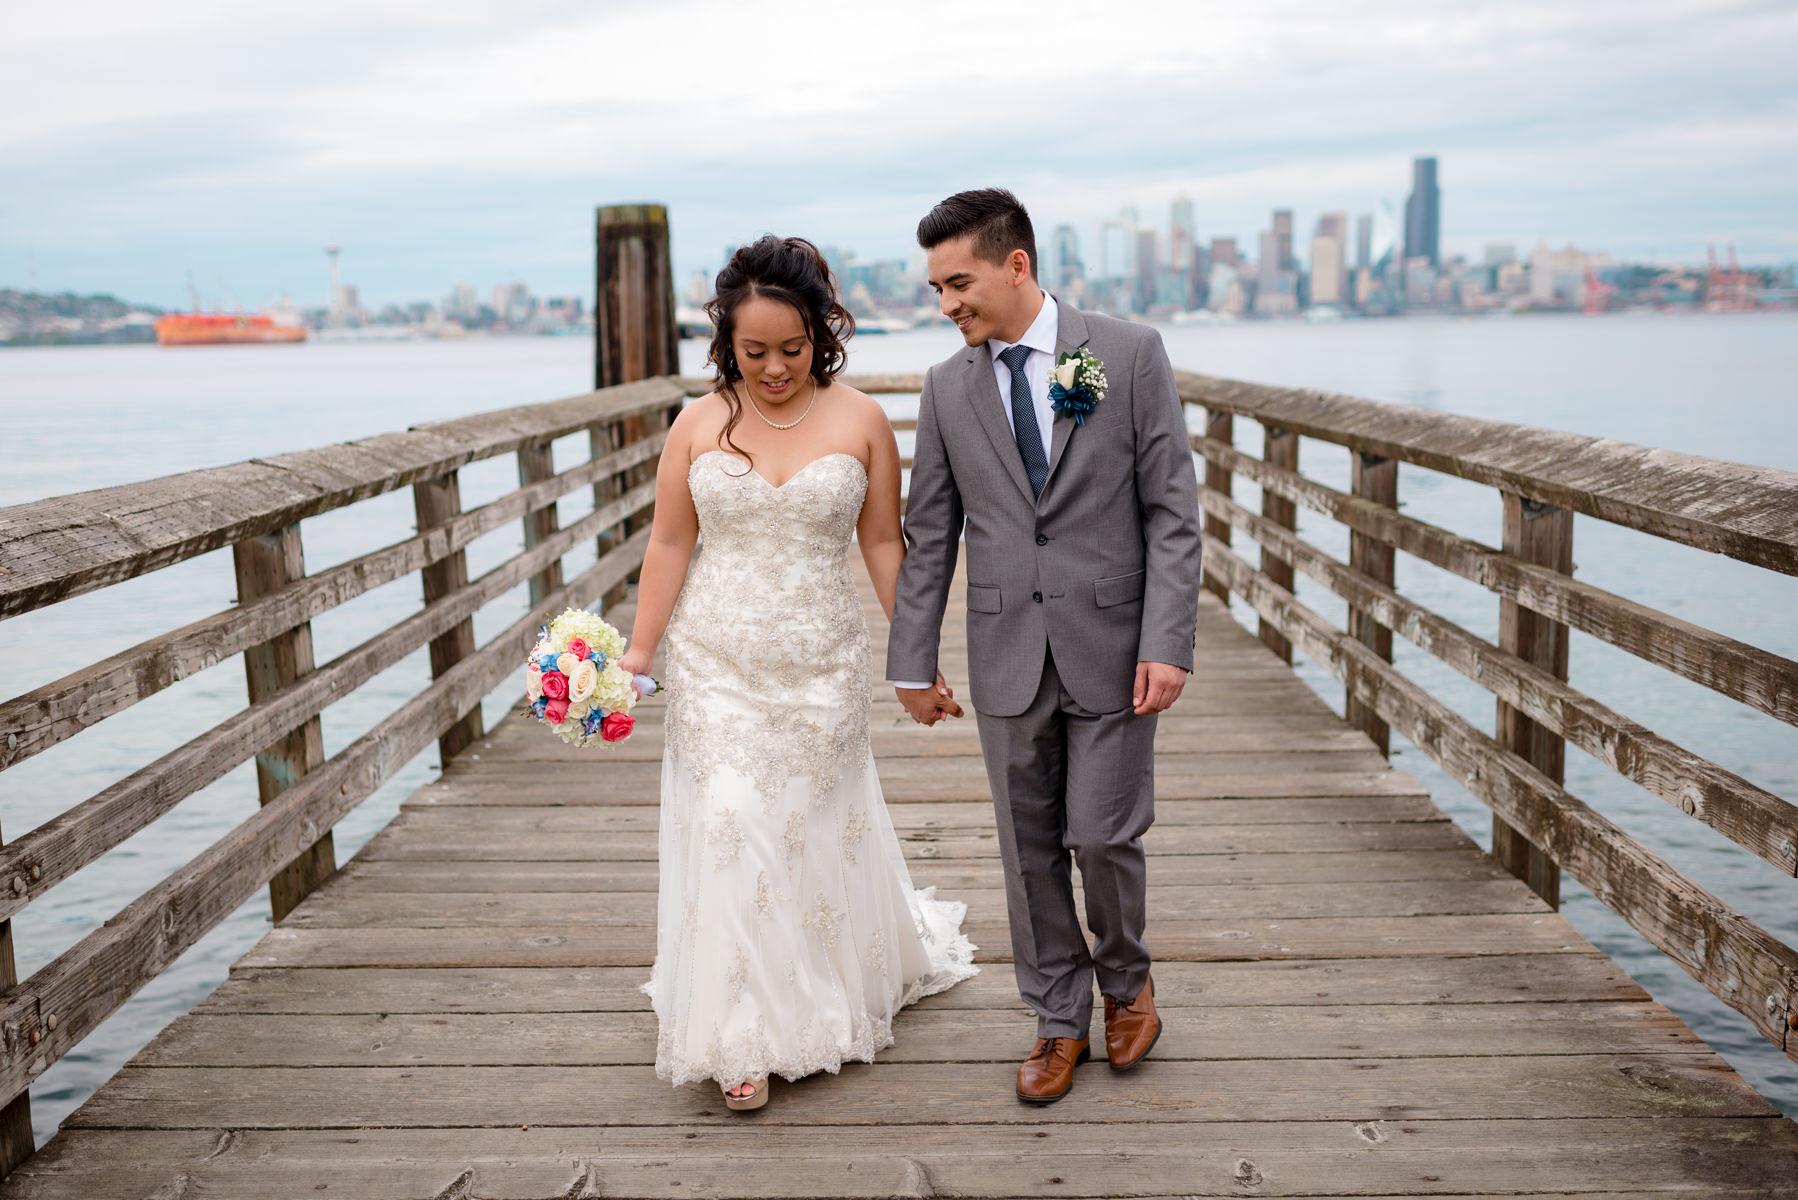 Andrew Tat - Documentary Wedding Photography - Salty's - Seattle, Washington -Mark & Marcy - 08.jpg